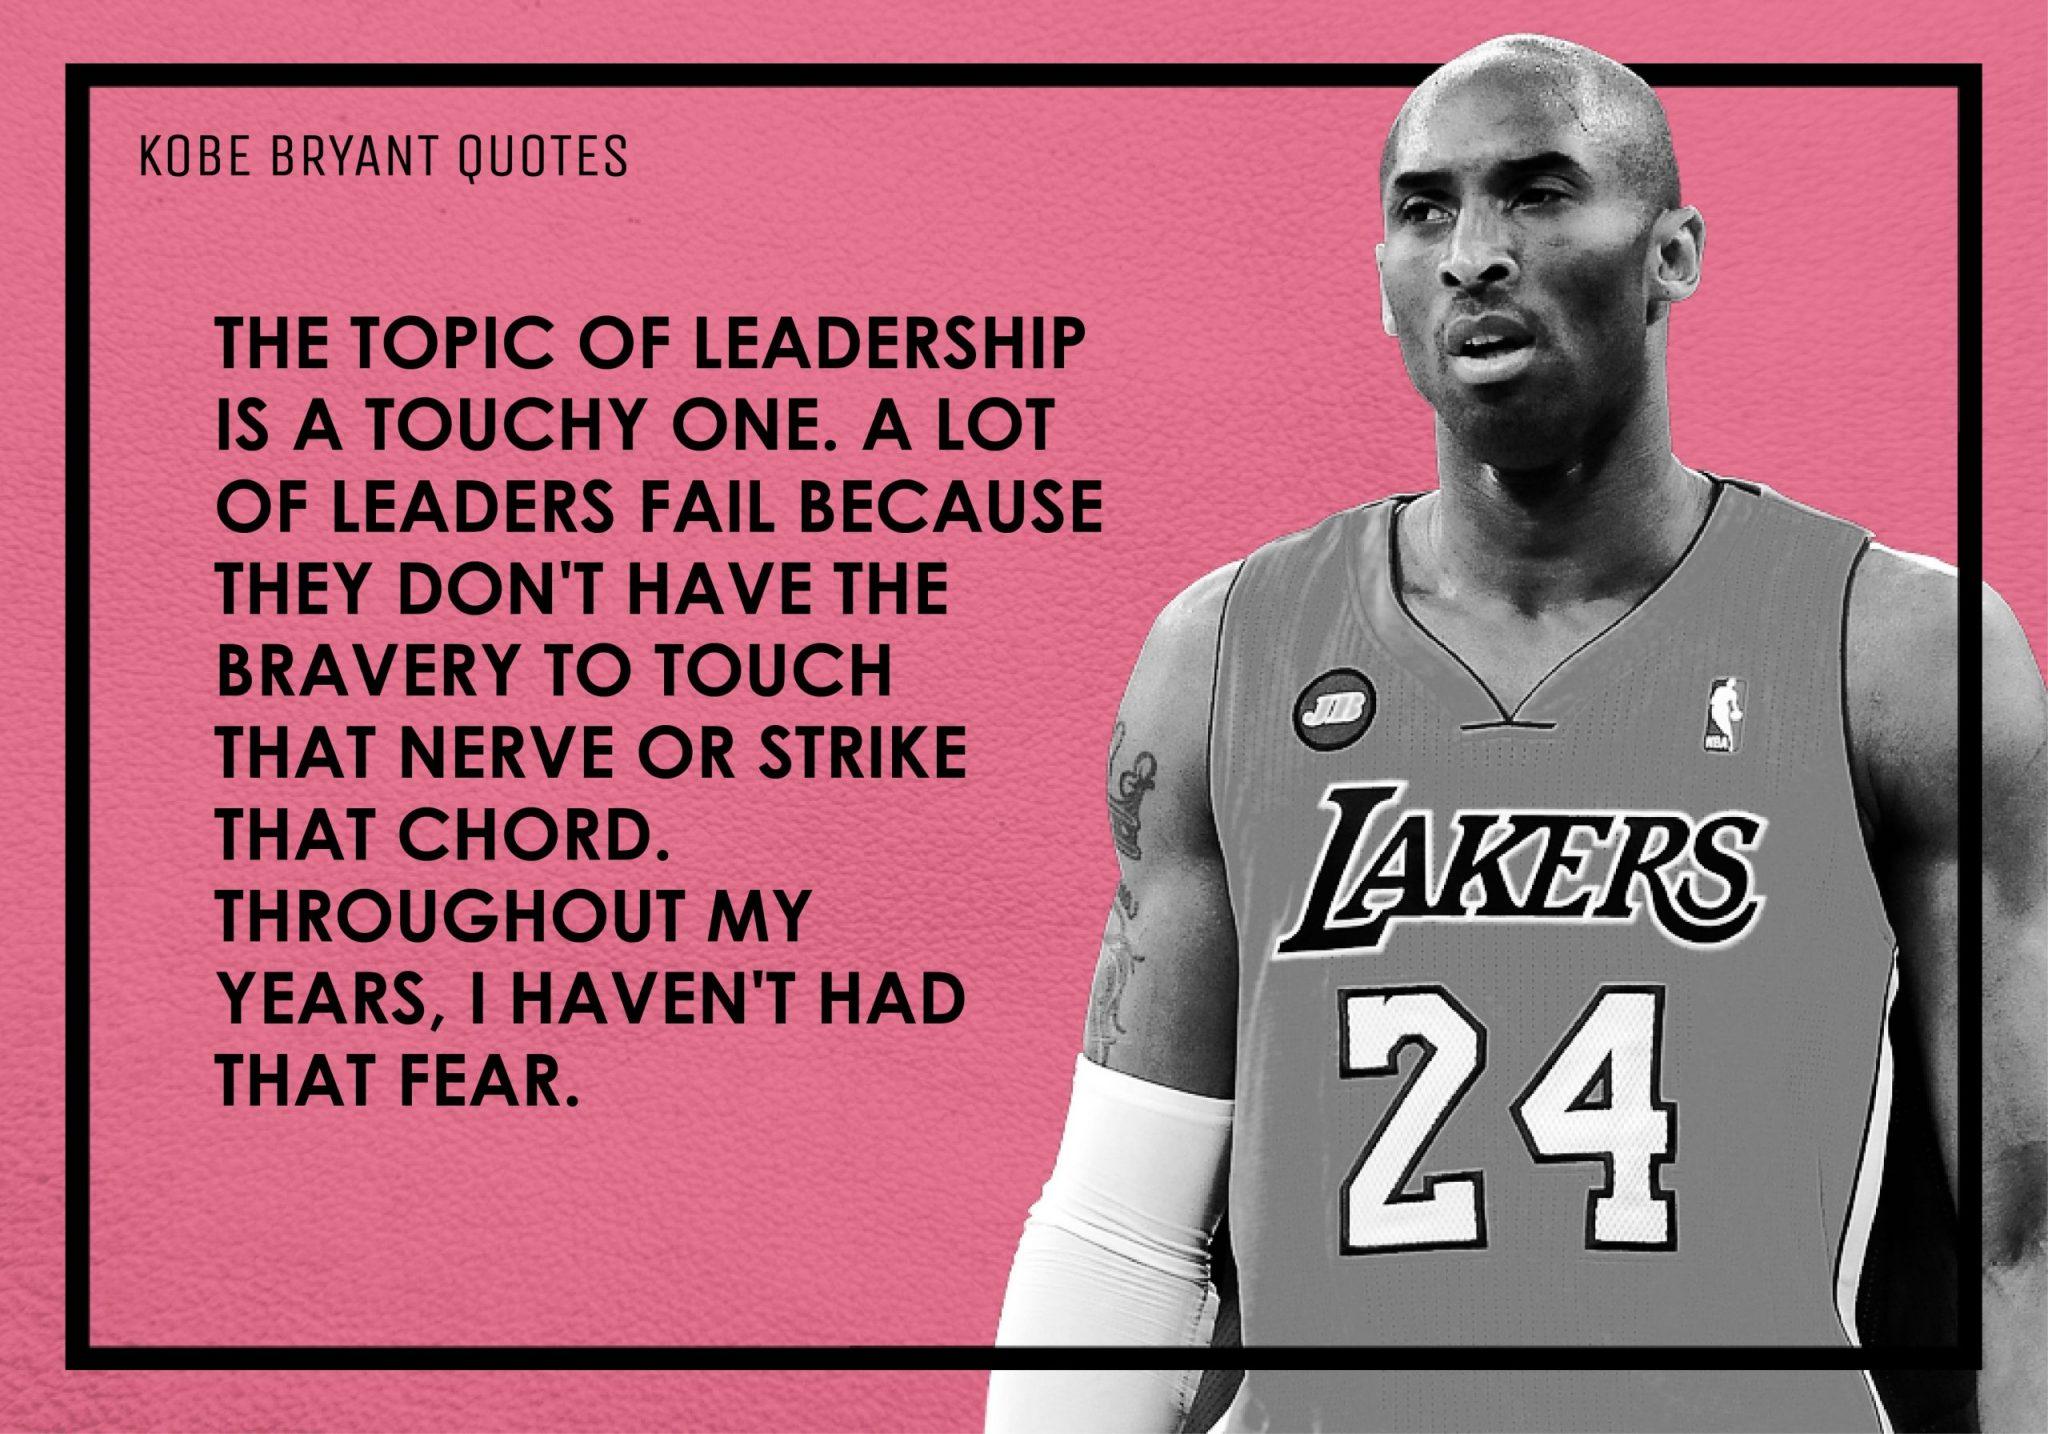 Kobe Bryant Quotes (4)